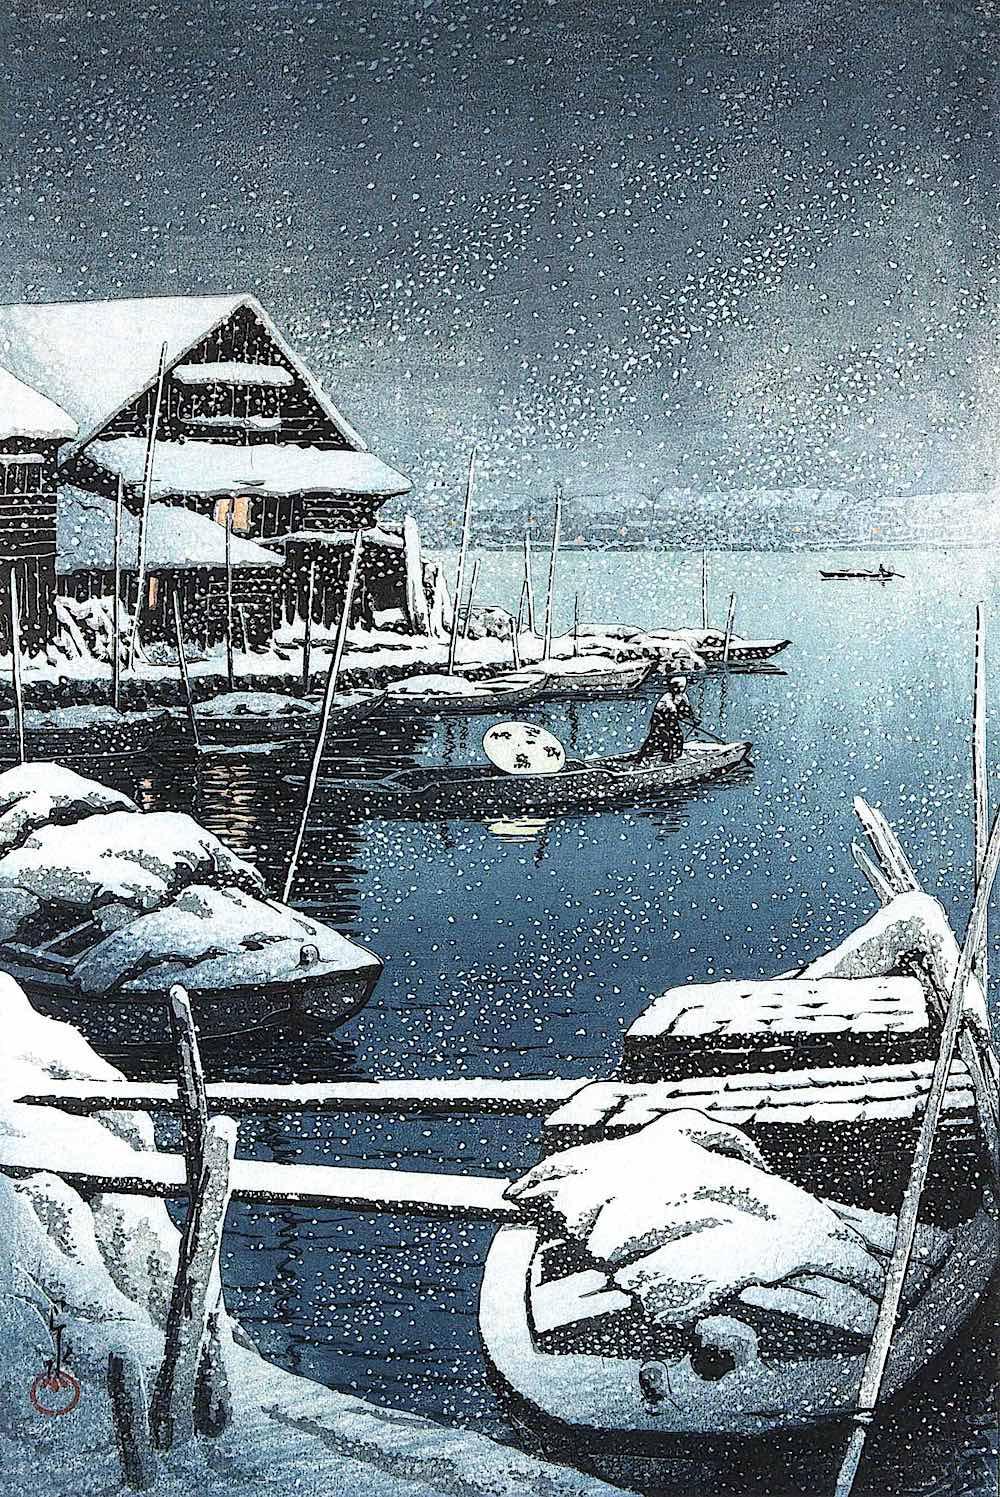 Kawase Hasui harbour docks in winter snow